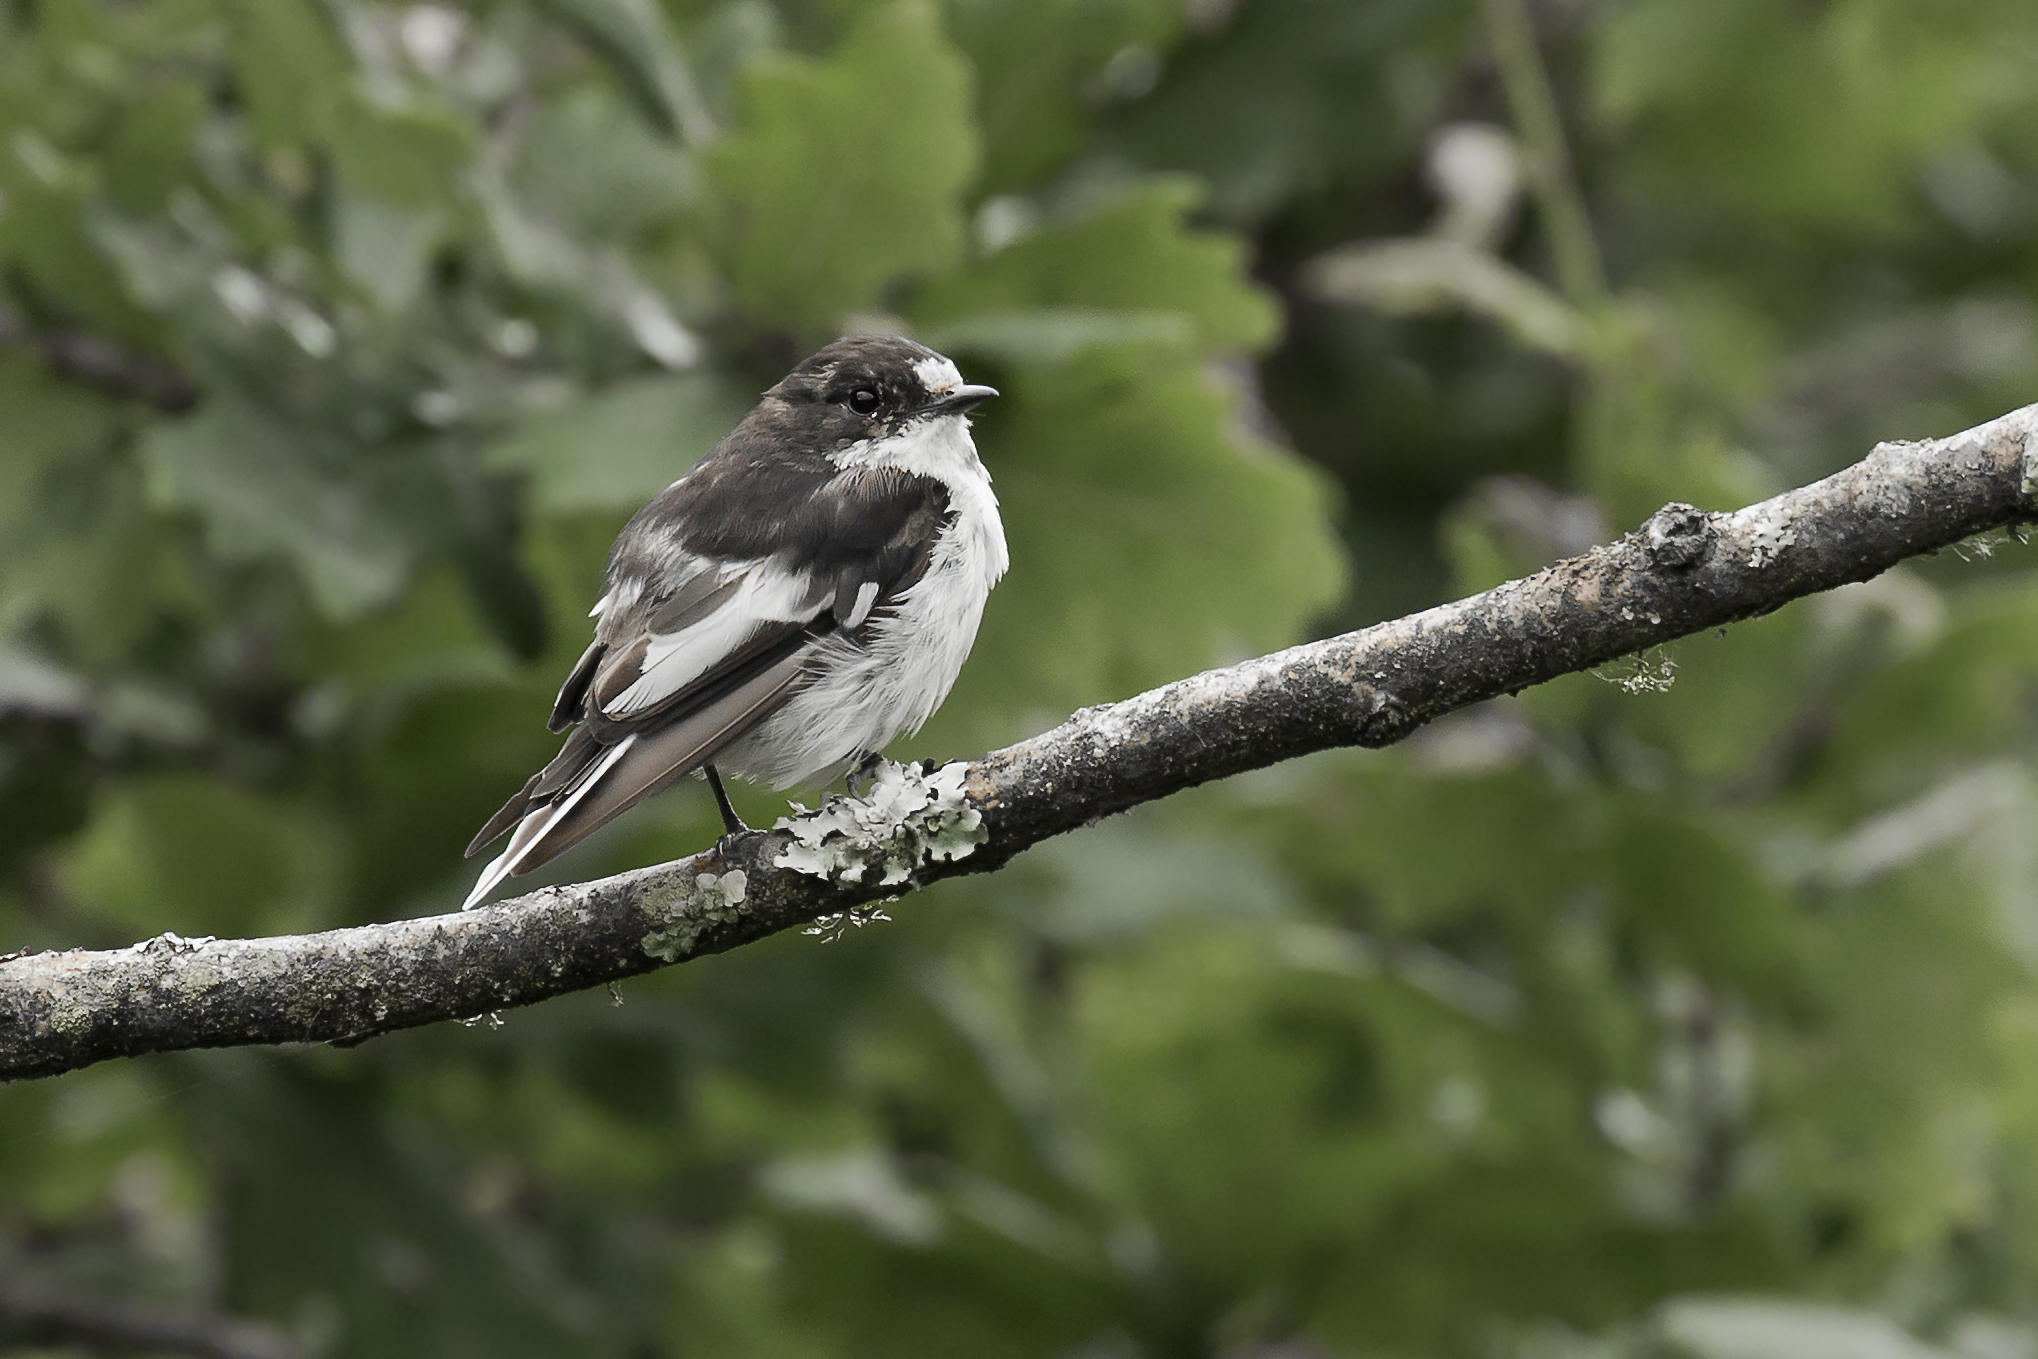 Pied Flycatcher Male (Possibly Juvi or Malt)